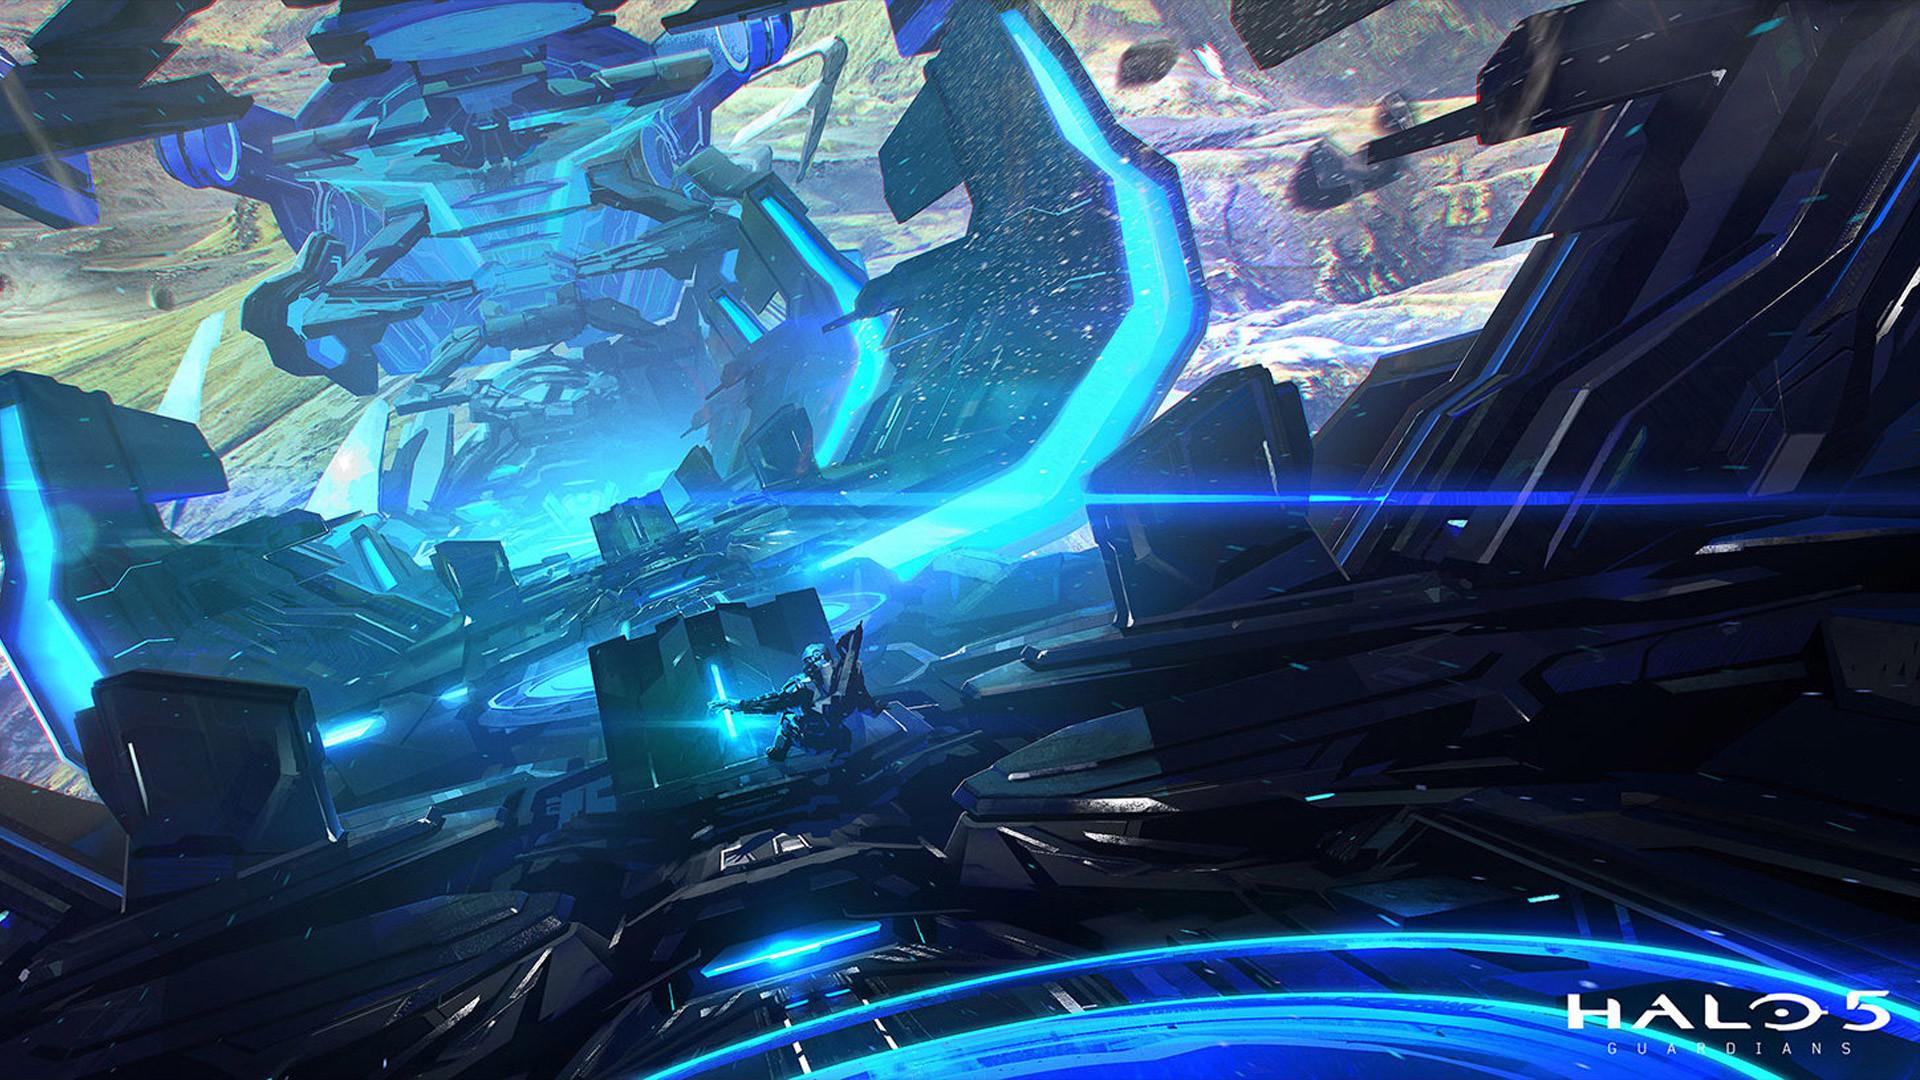 Halo 5: Guardians Wallpaper in 1920×1080